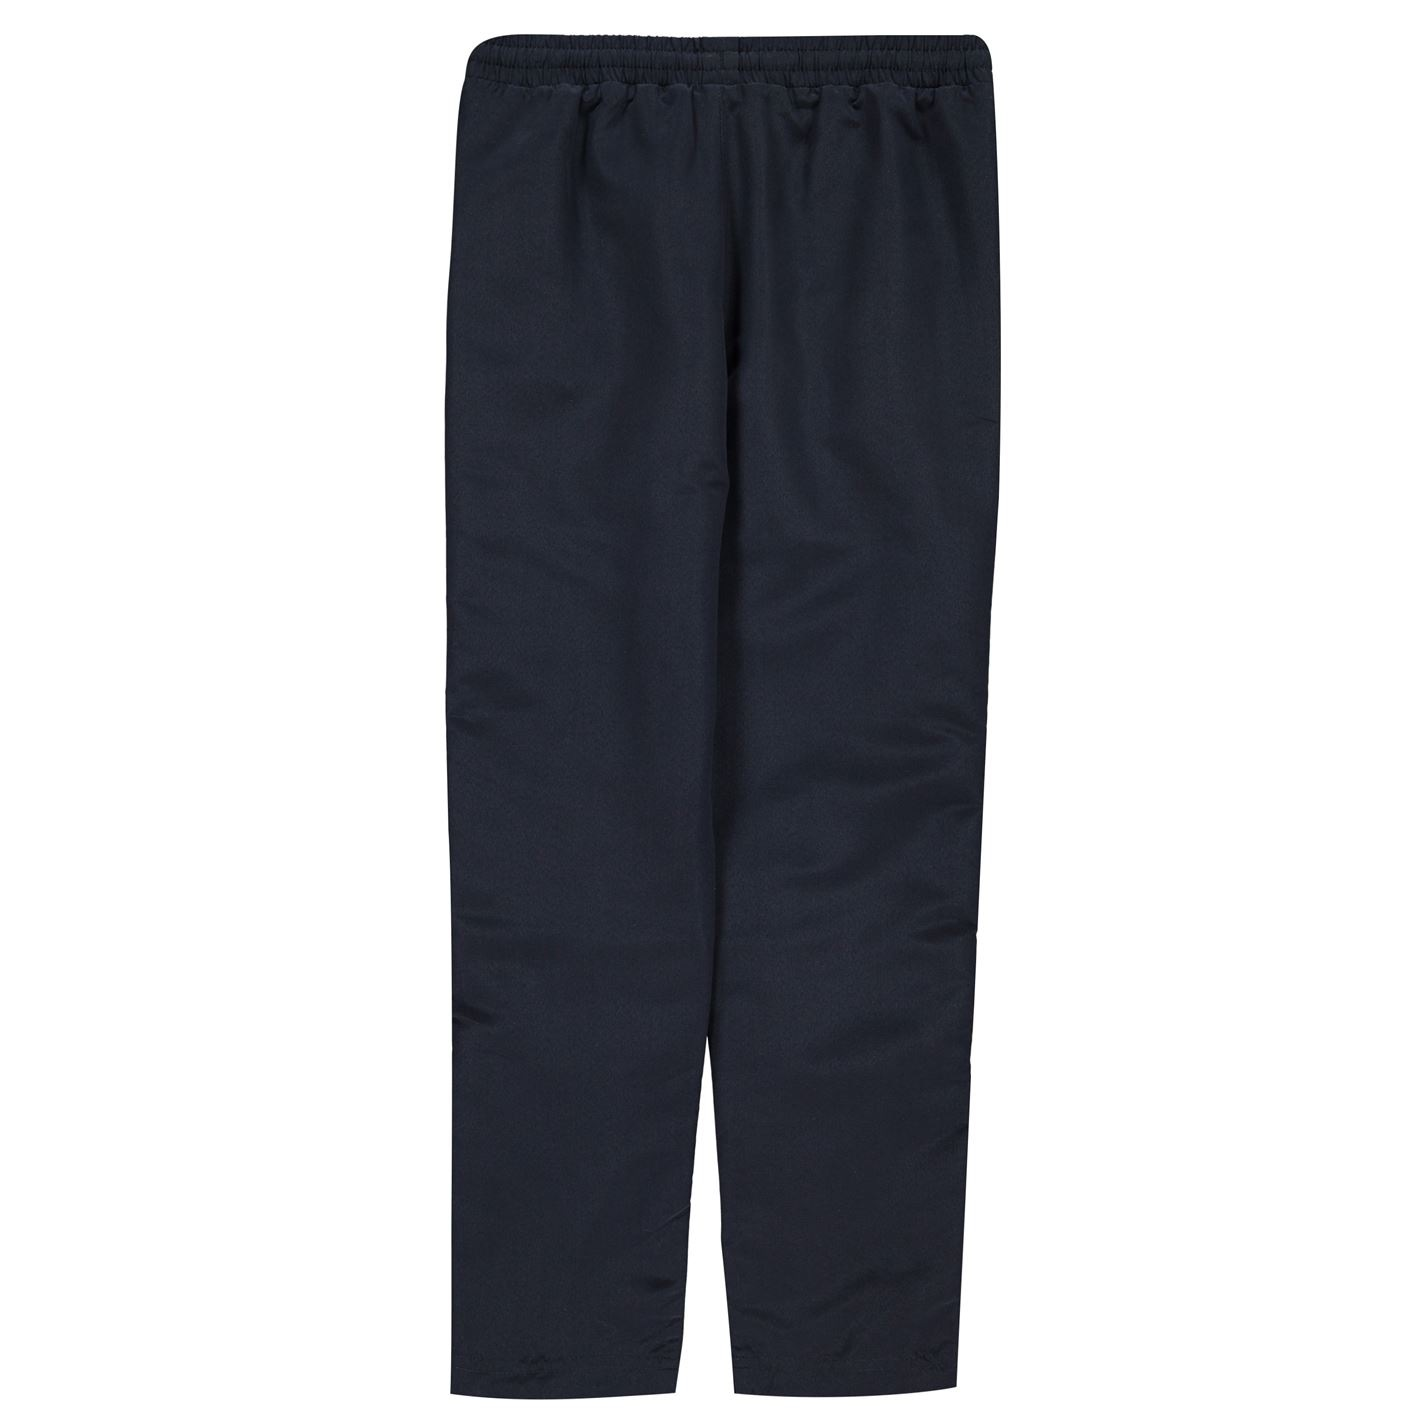 Pantaloni Slazenger fara mansete Woven pentru baietei bleumarin